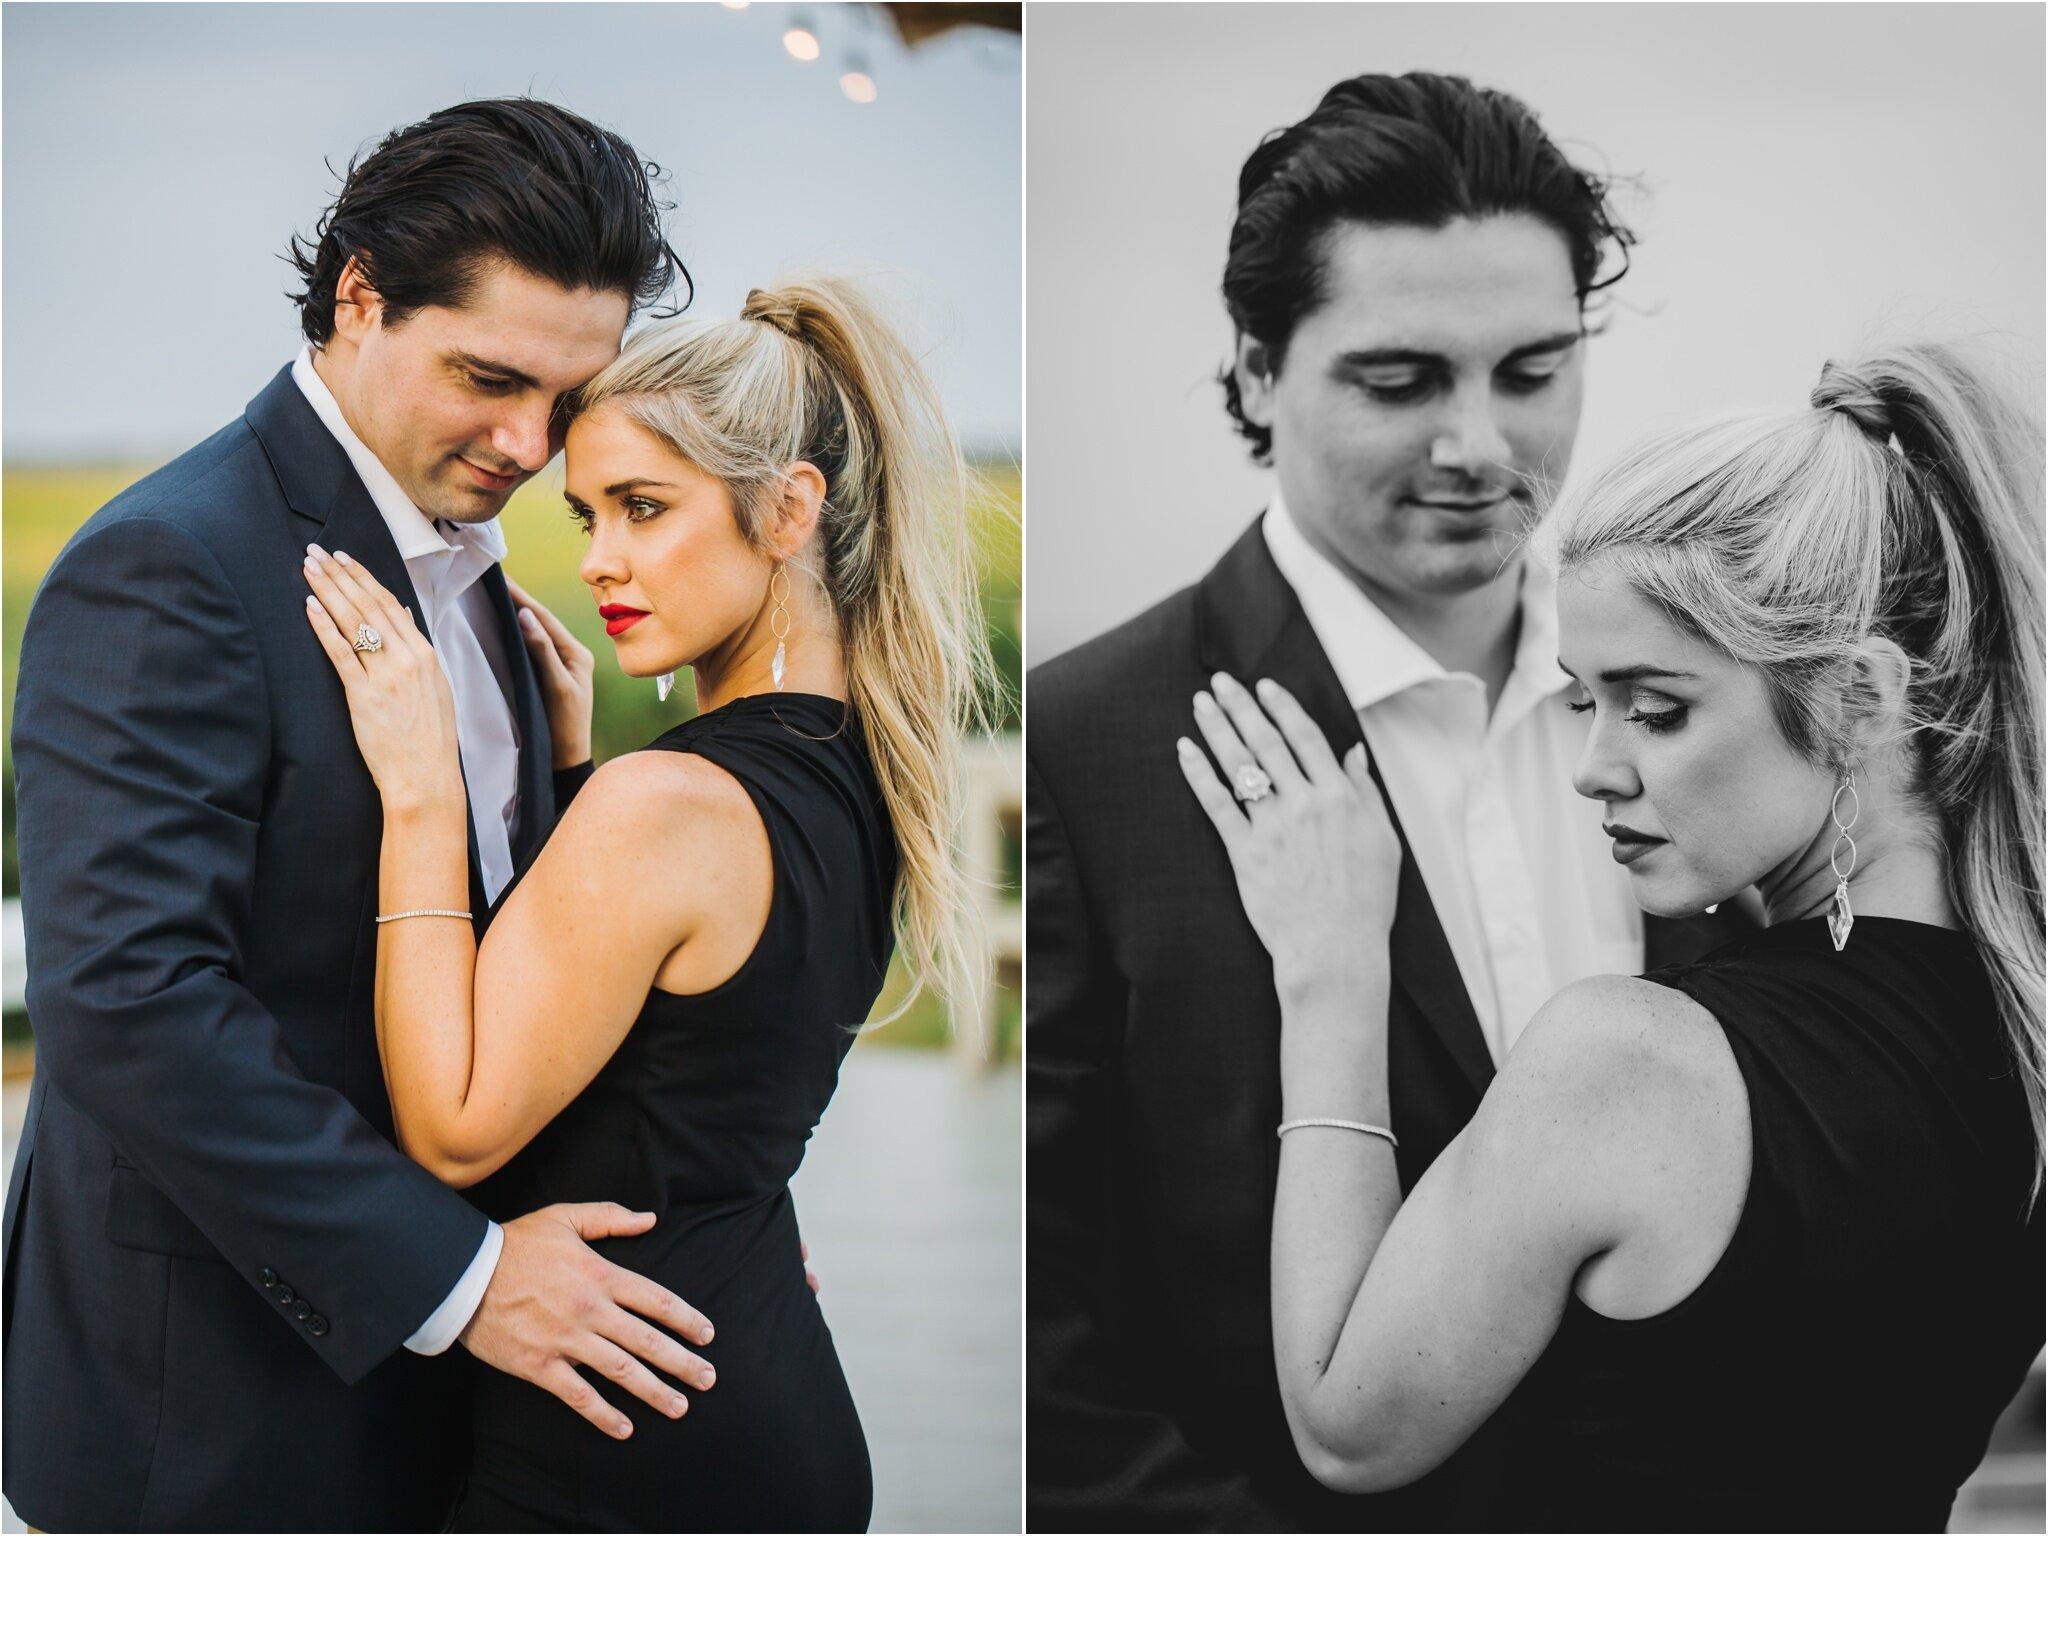 Rainey_Gregg_Photography_St._Simons_Island_Georgia_California_Wedding_Portrait_Photography_1845.jpg